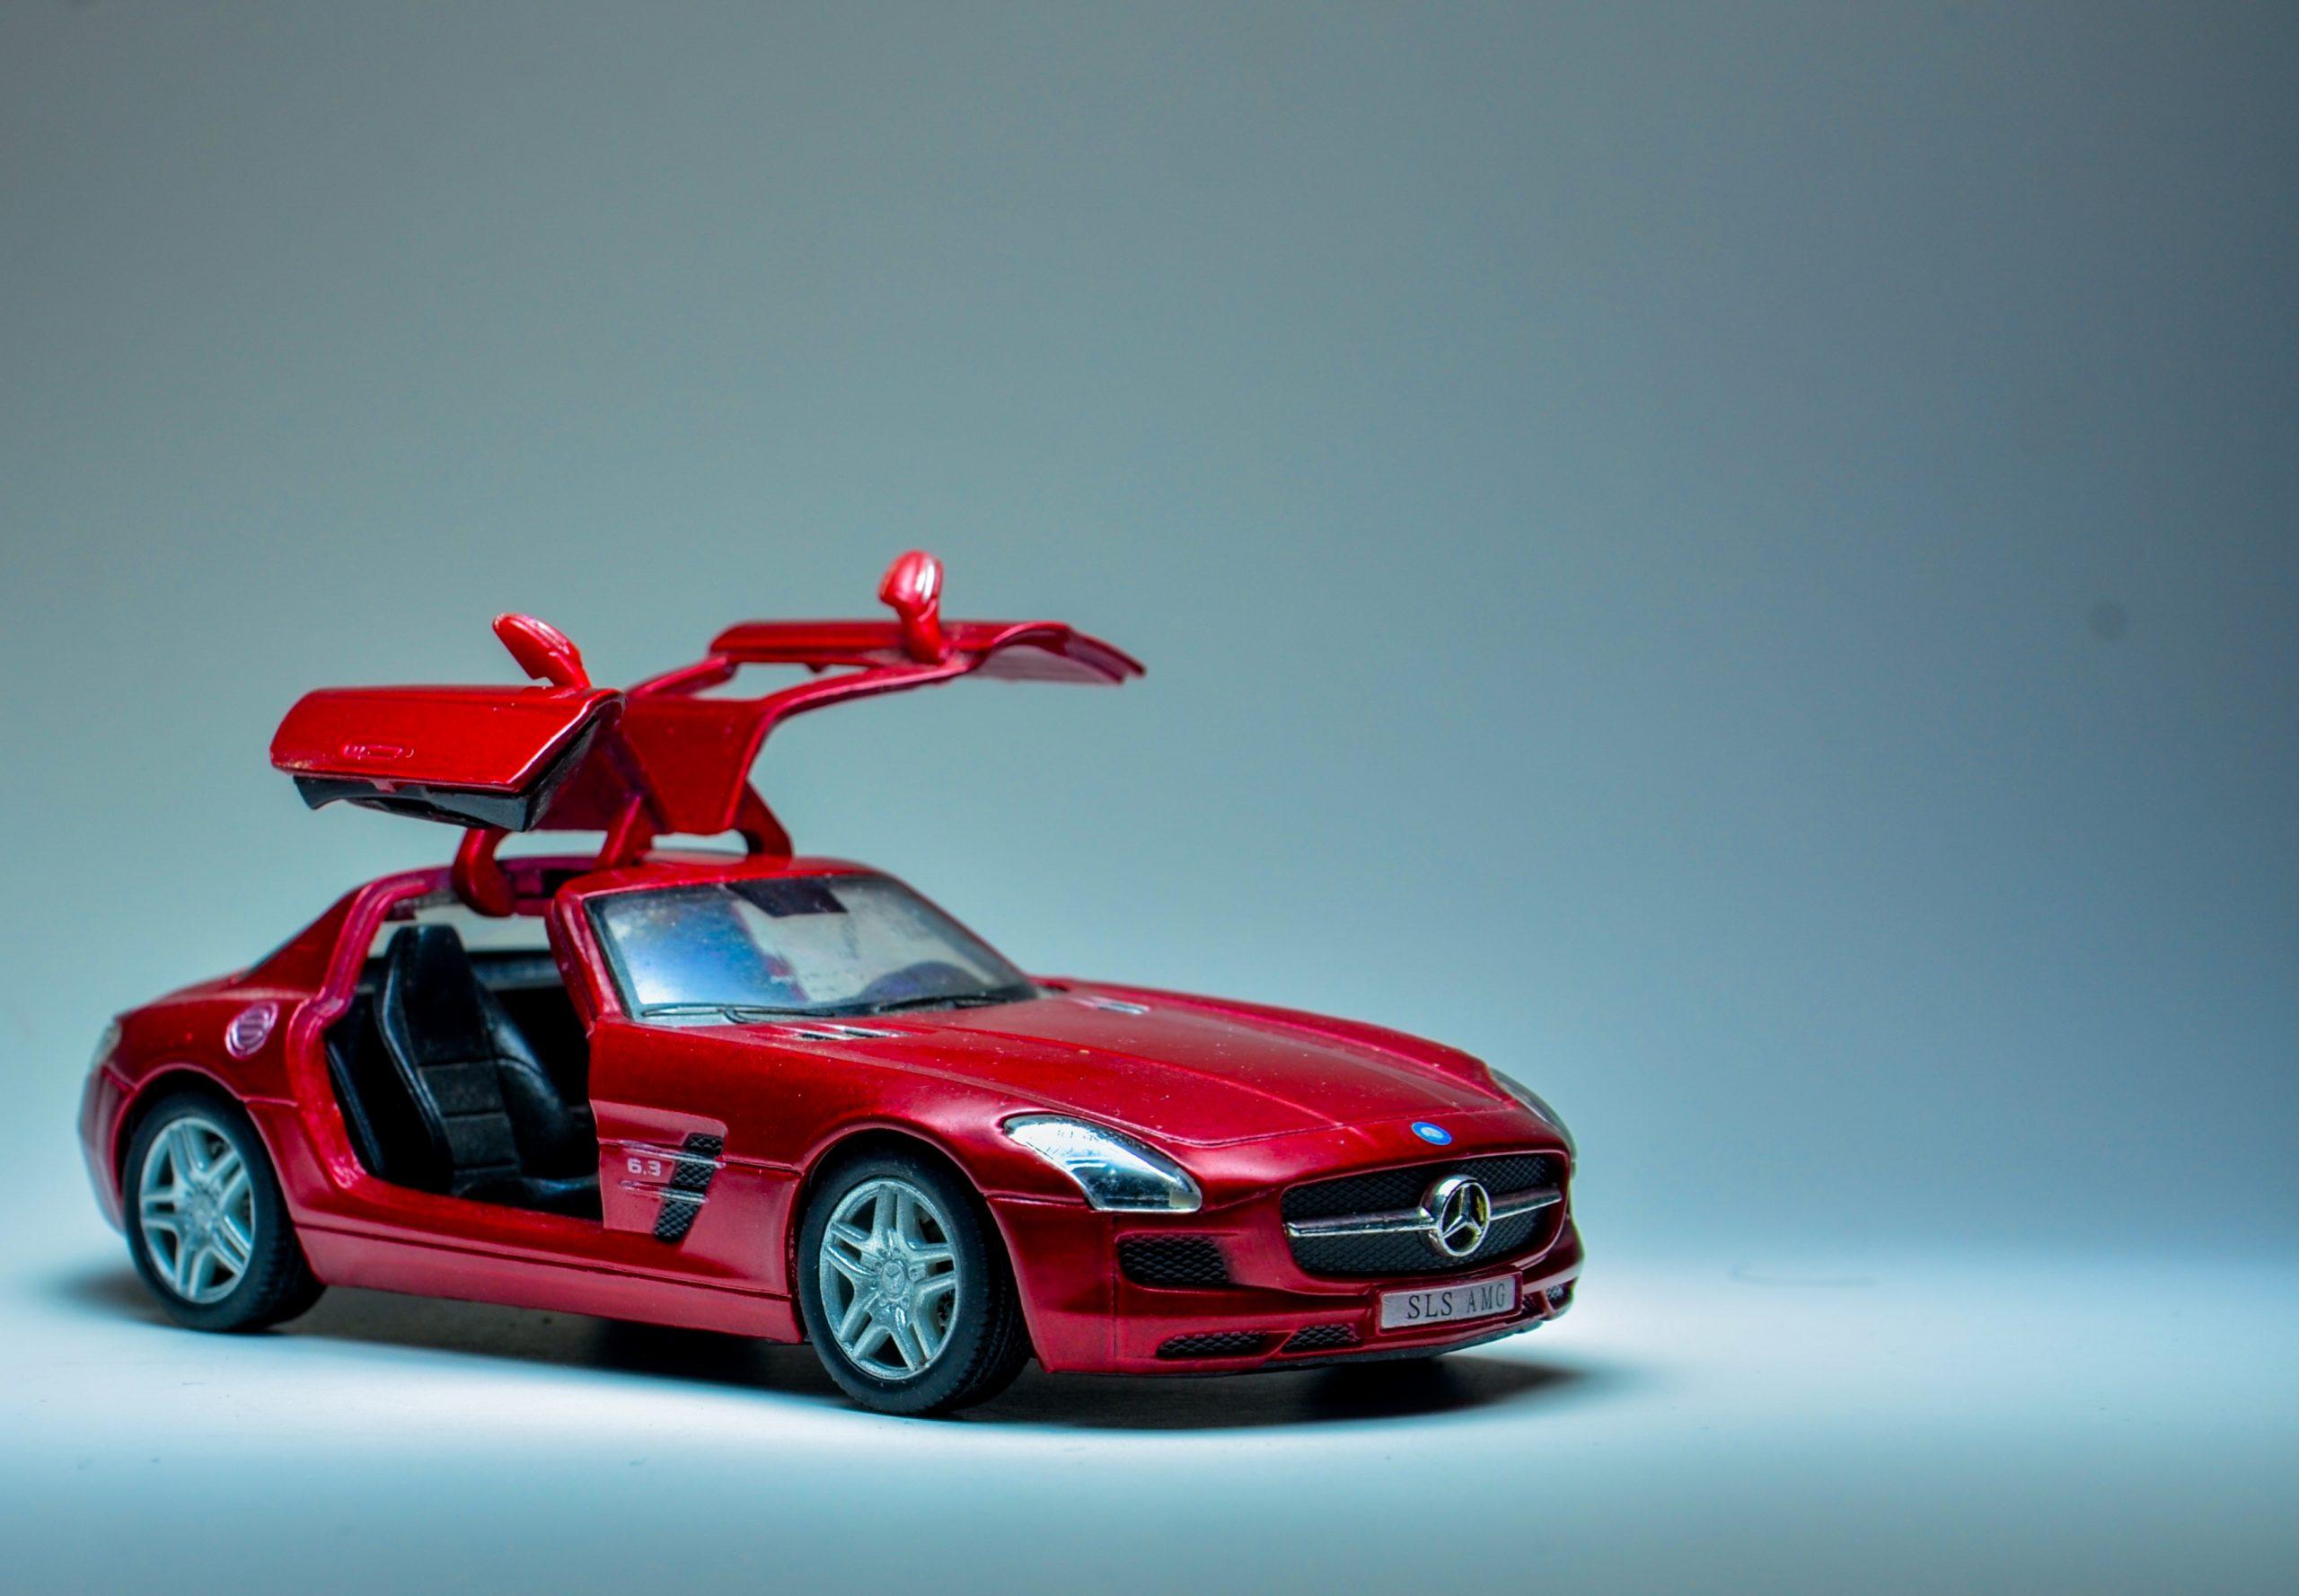 Toy Mercedes Car